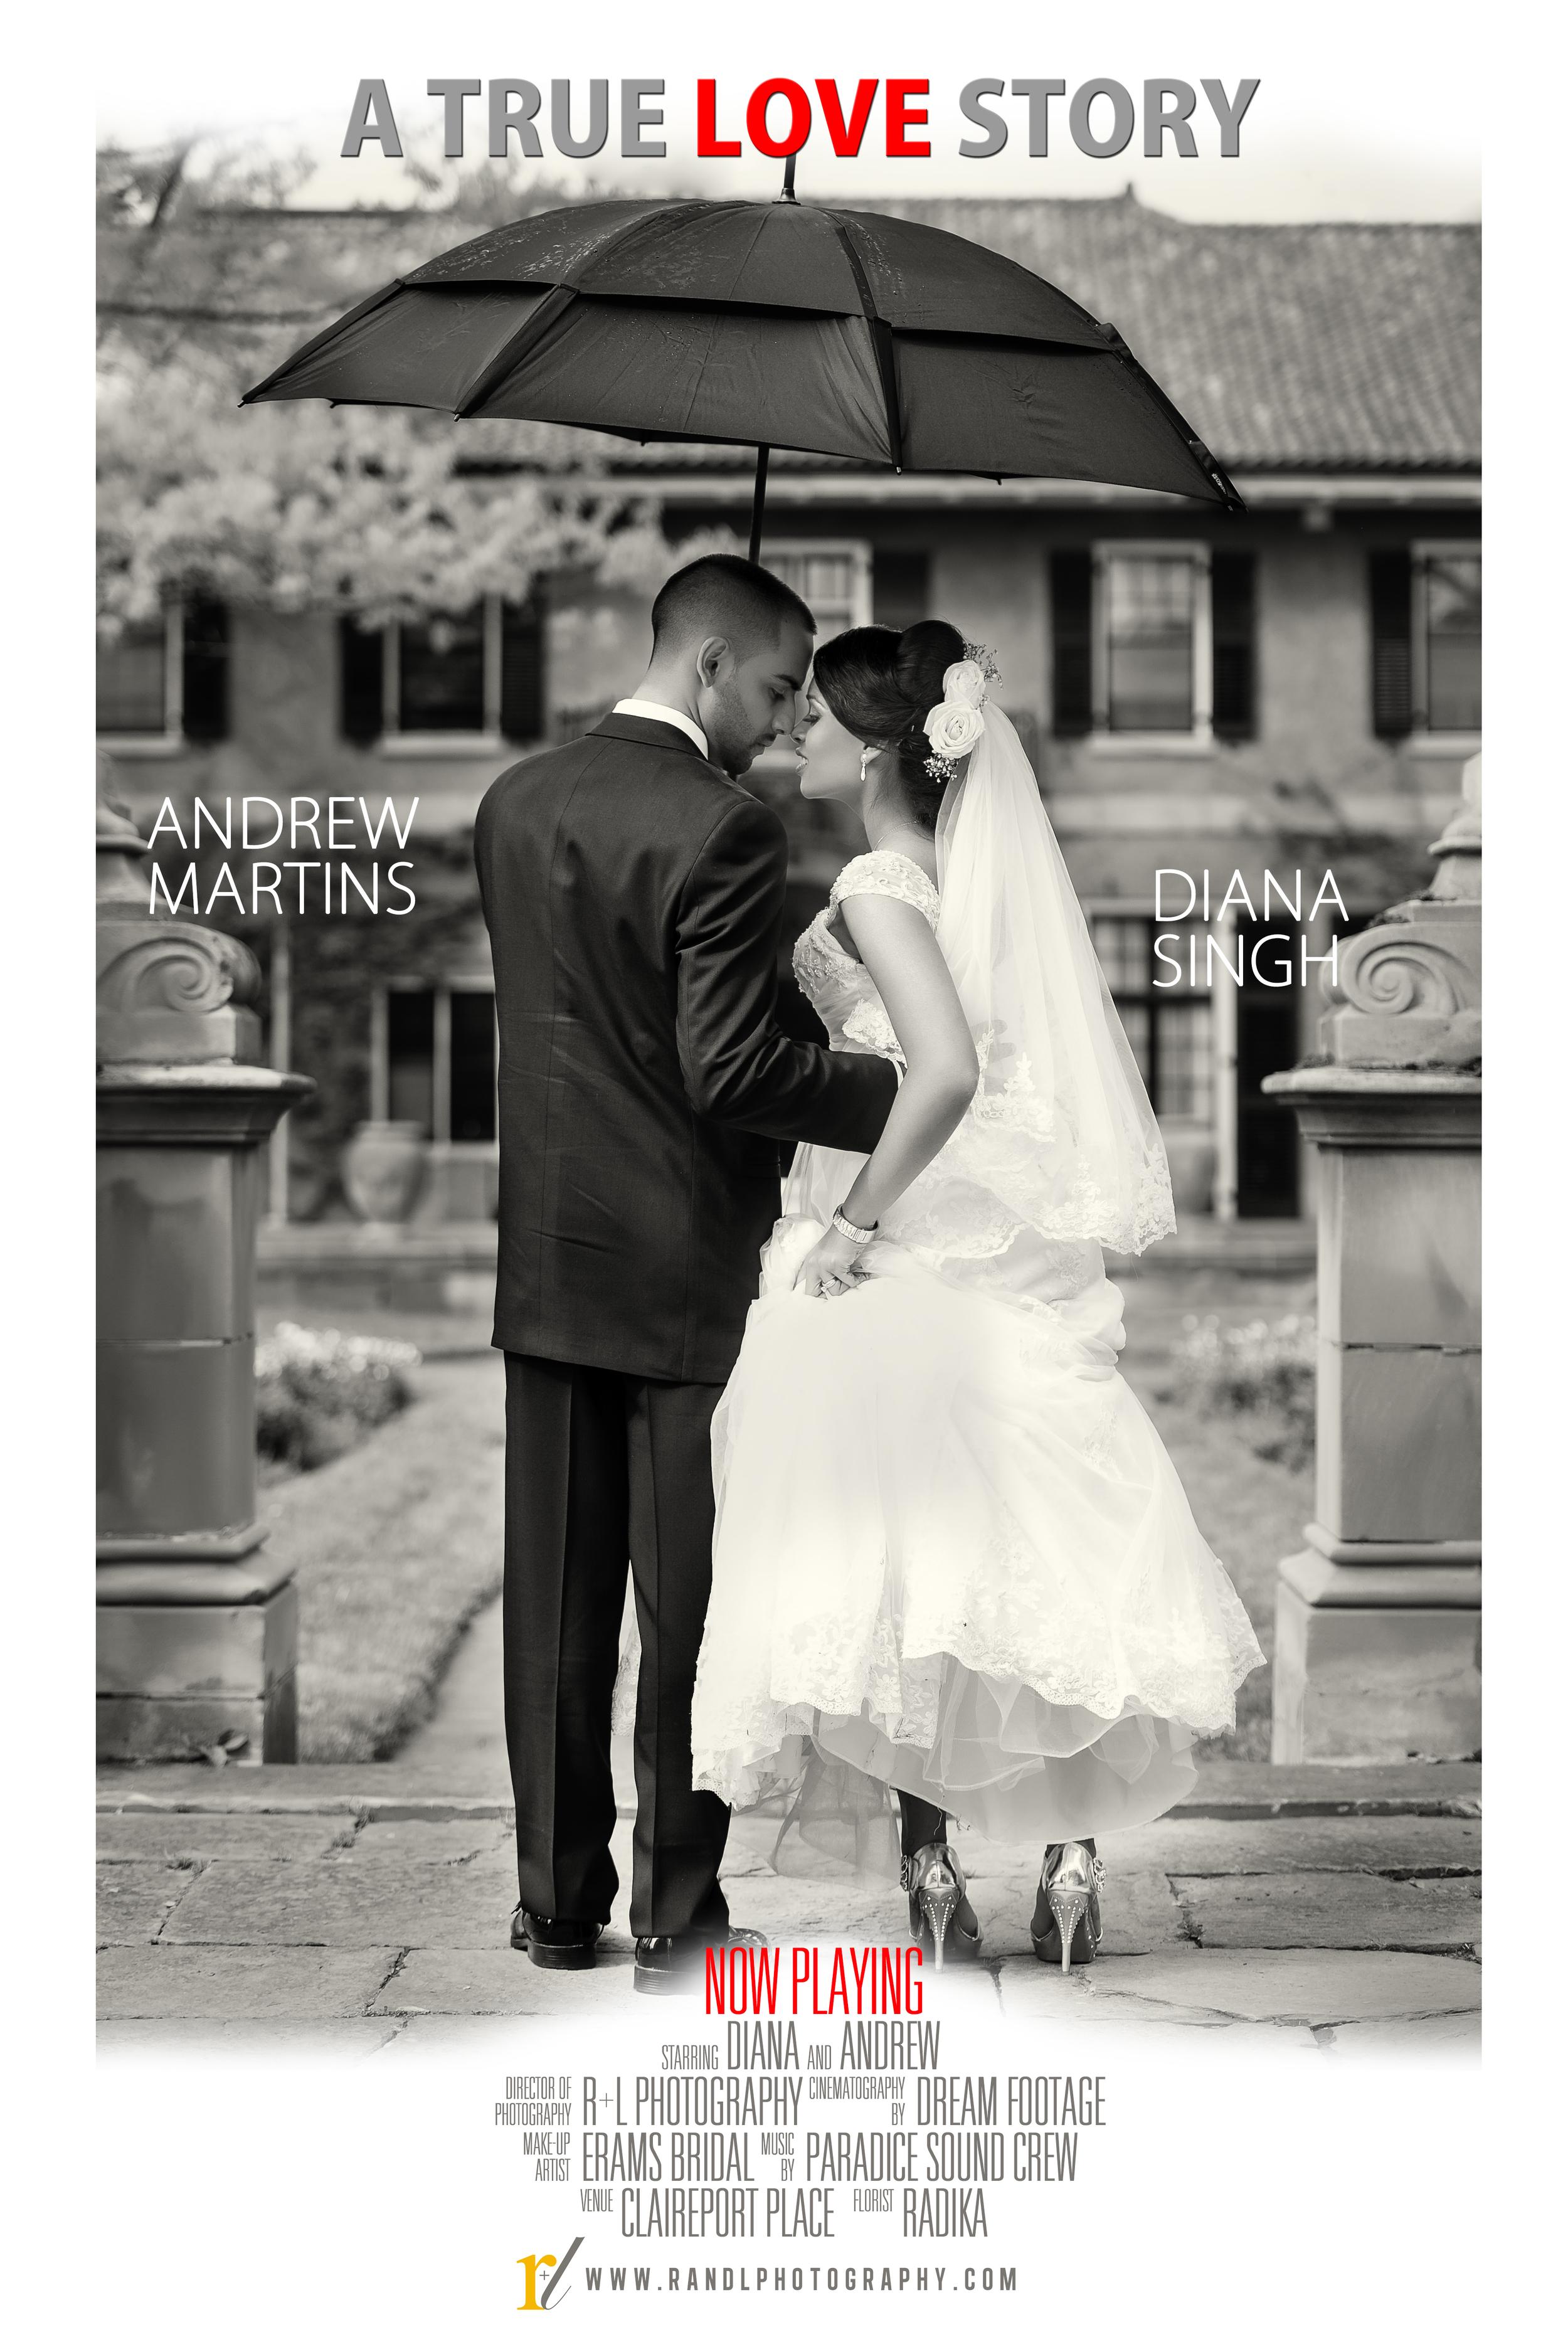 Movie-Poster-Template.jpg